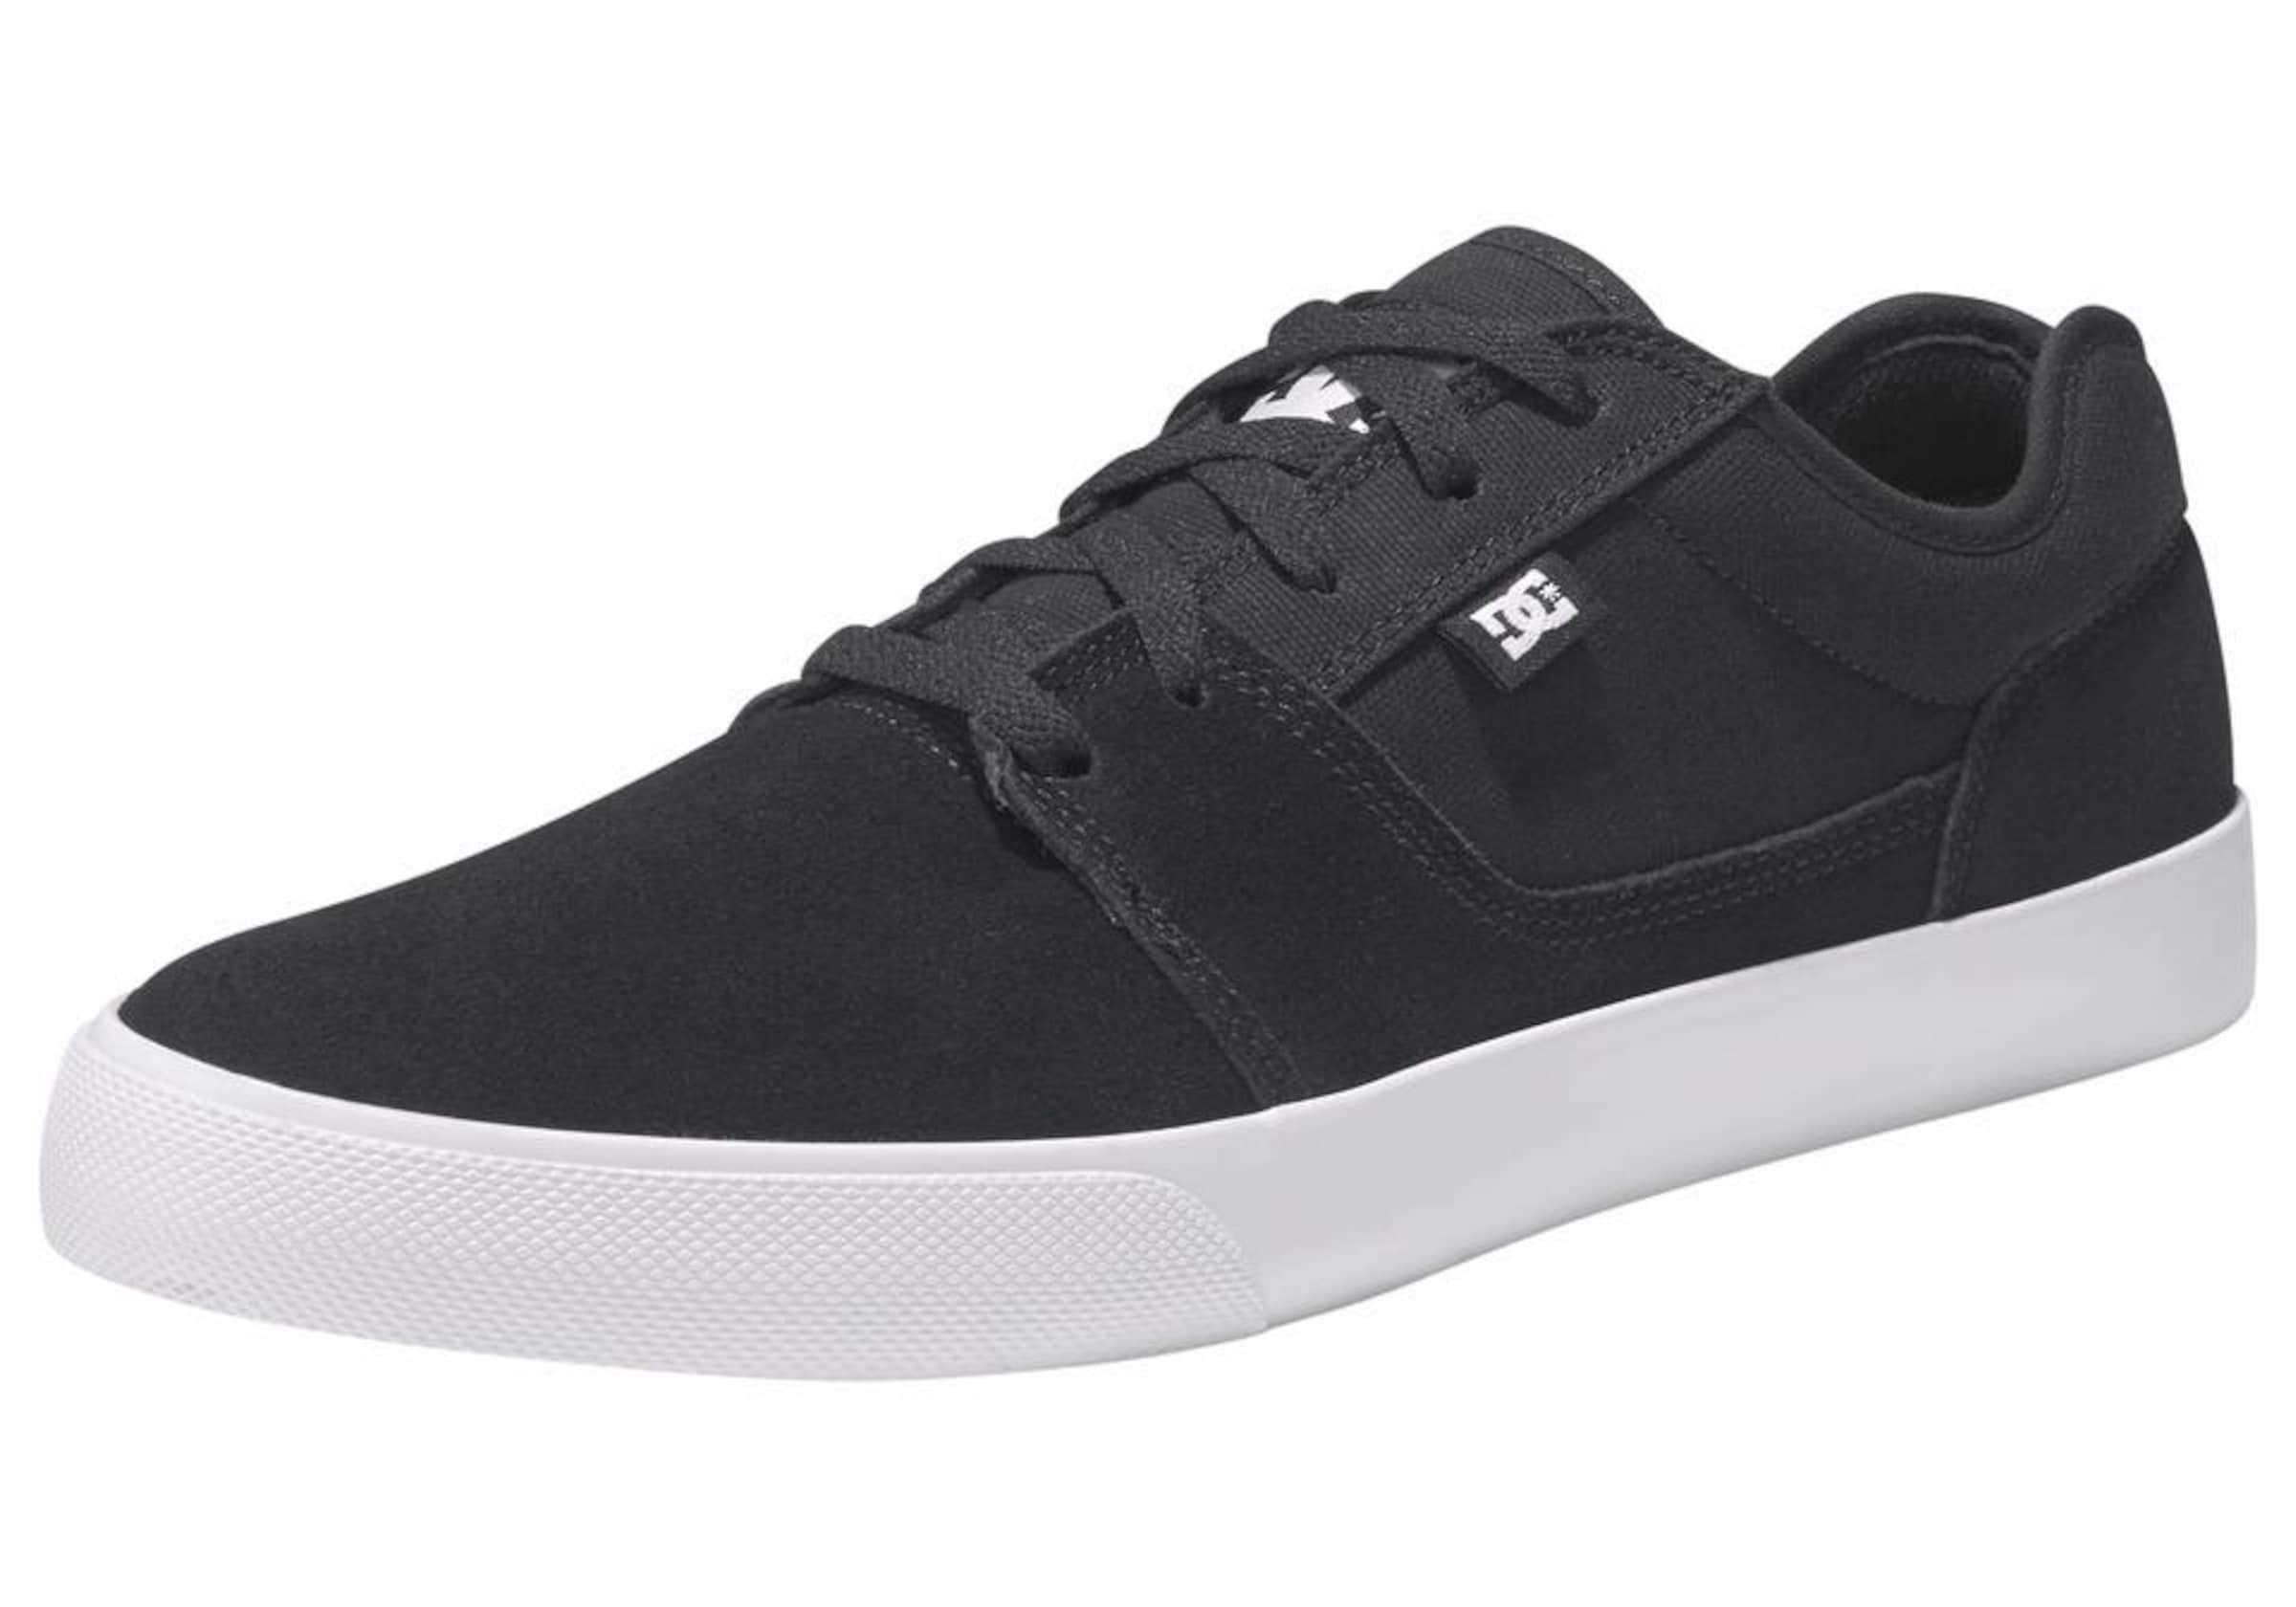 Xkwk' Shoes 'tonik Shoe In Schwarz Dc M Sneaker 29EHYWDI